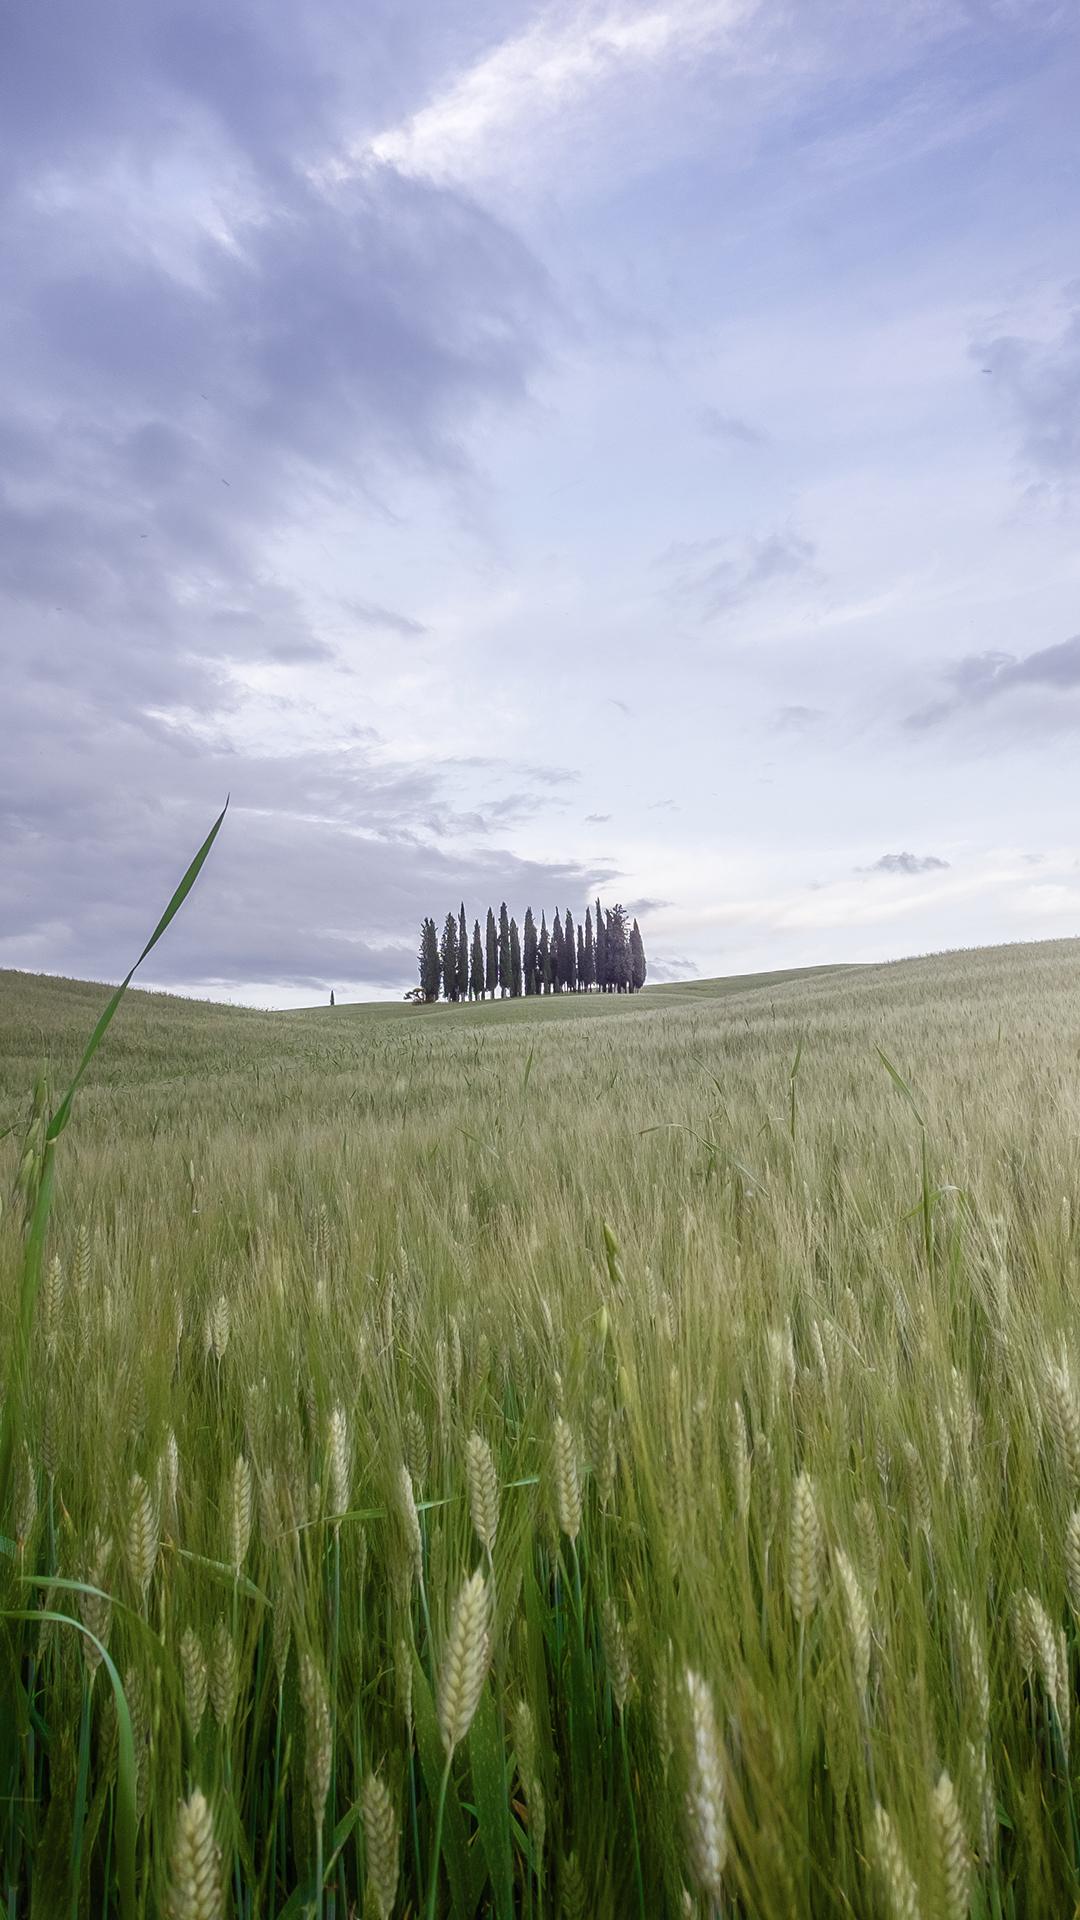 Wallpaper Nature Landscape Portrait Display Trees